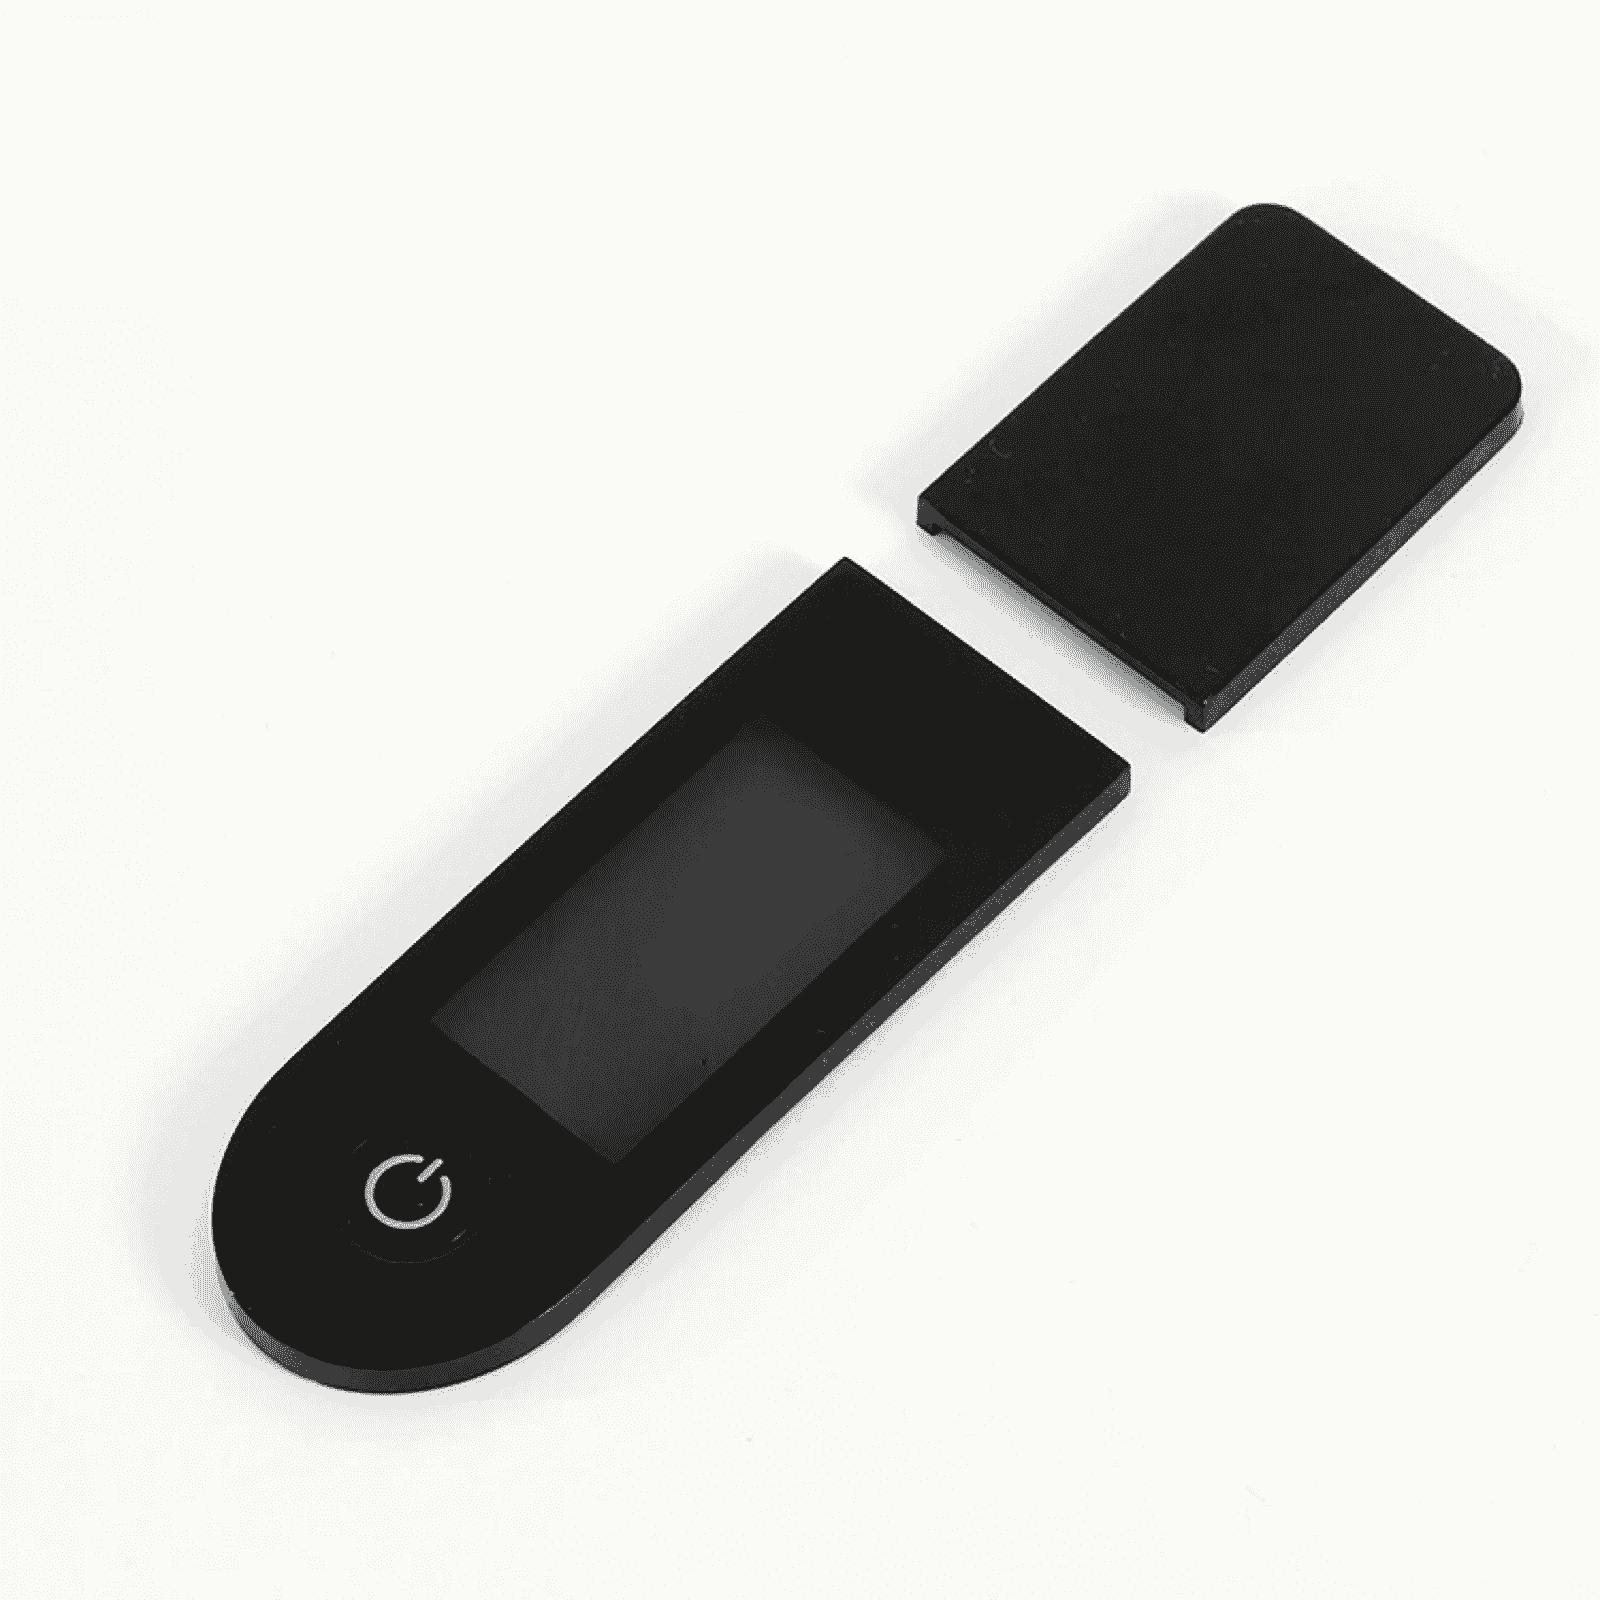 Kit de upgrade display Dashboard Xiaomi M365 PRO 4